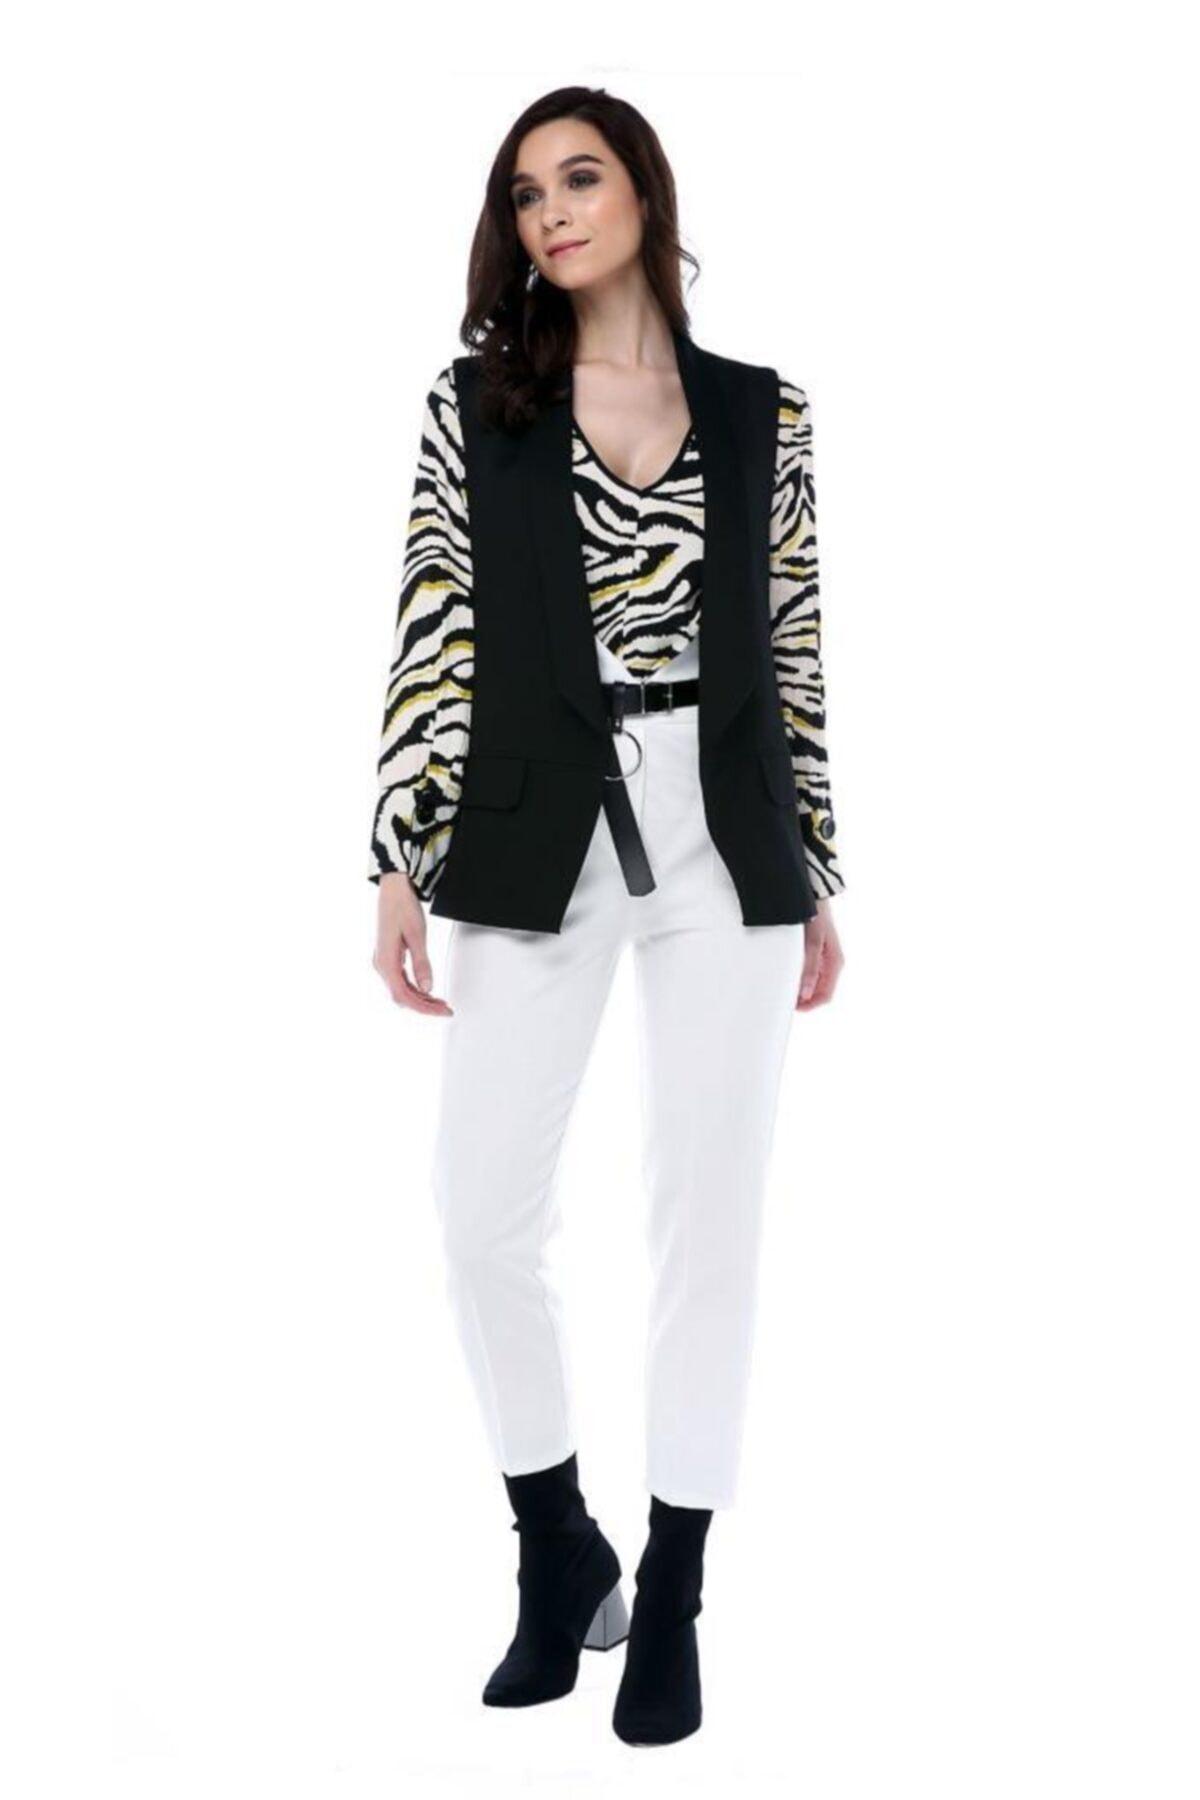 Modkofoni Yüksek Bel Deri Kemerli Beyaz Bilek Pantolon 1